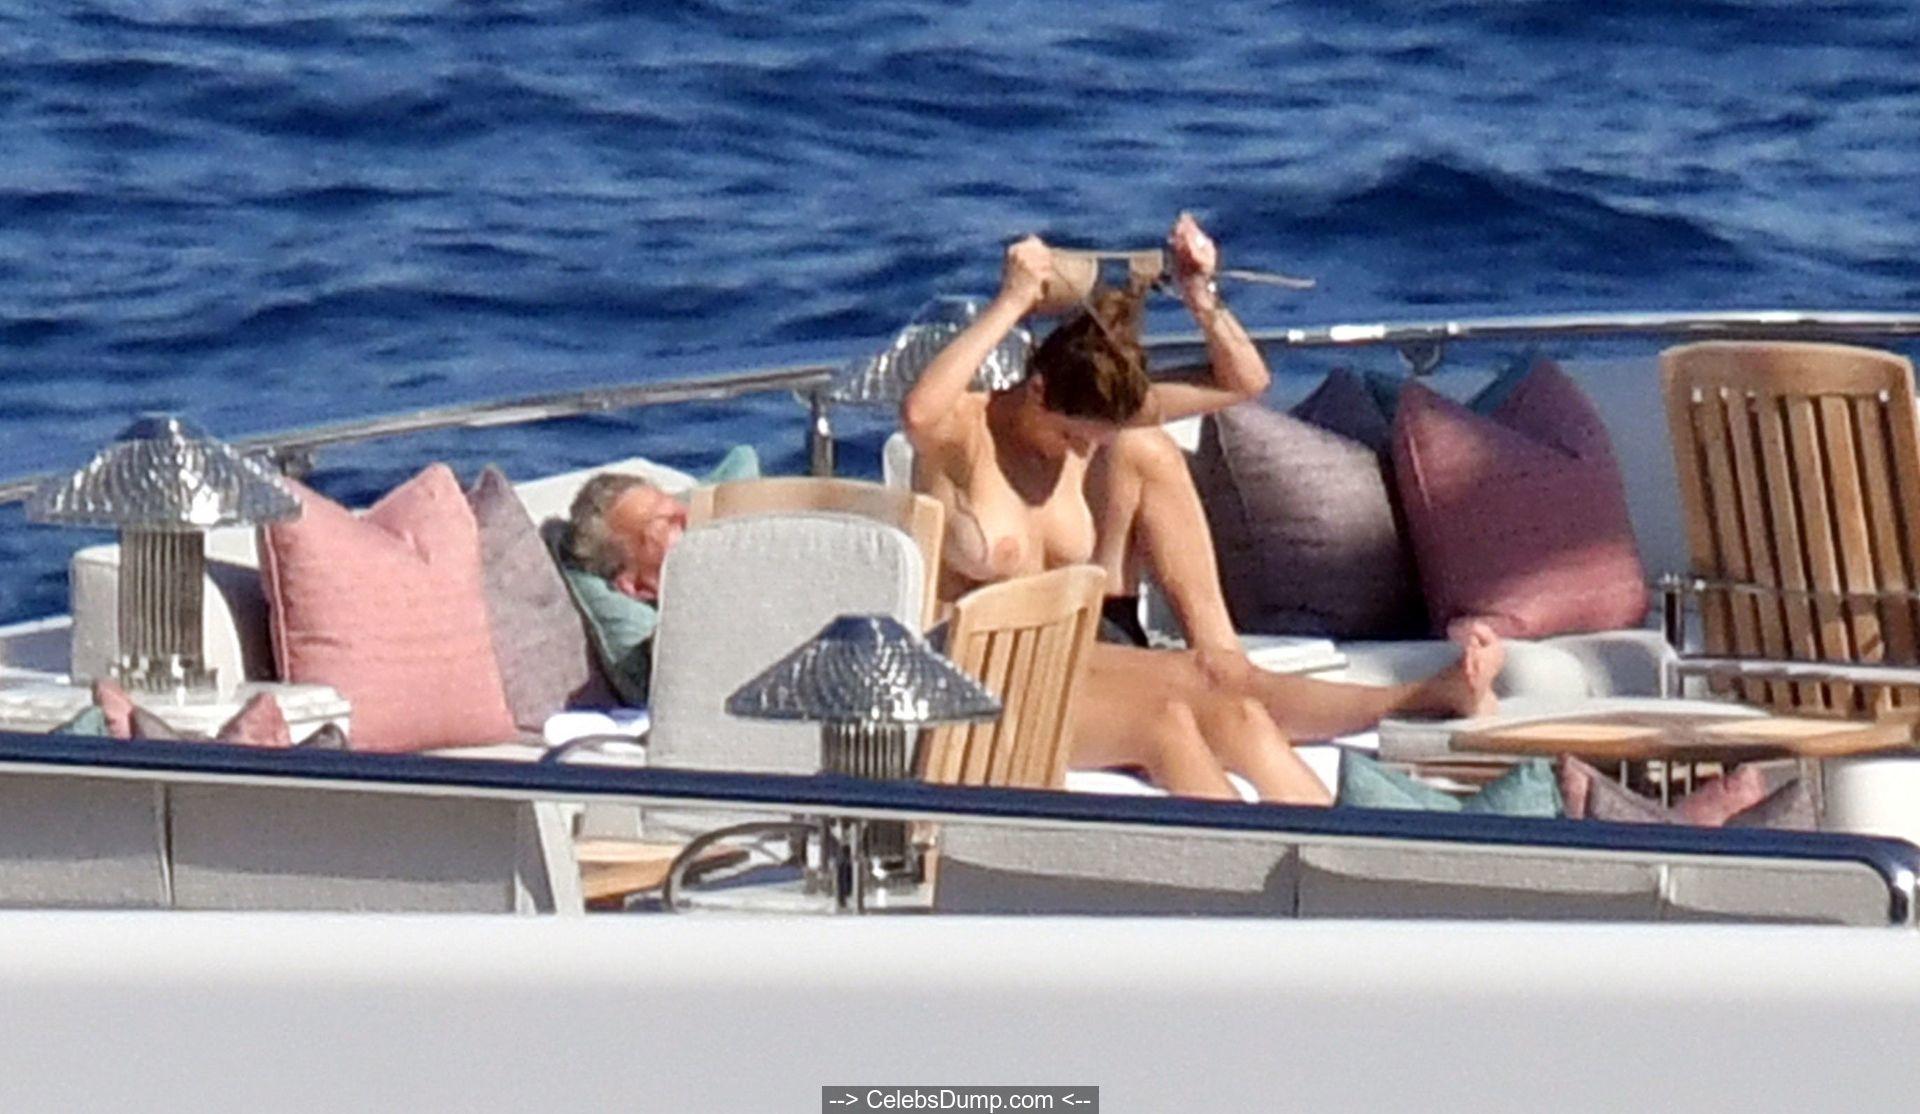 katharine-mcphee-topless-on-a-boat-in-capri-italy-july-03-2019-10.jpg